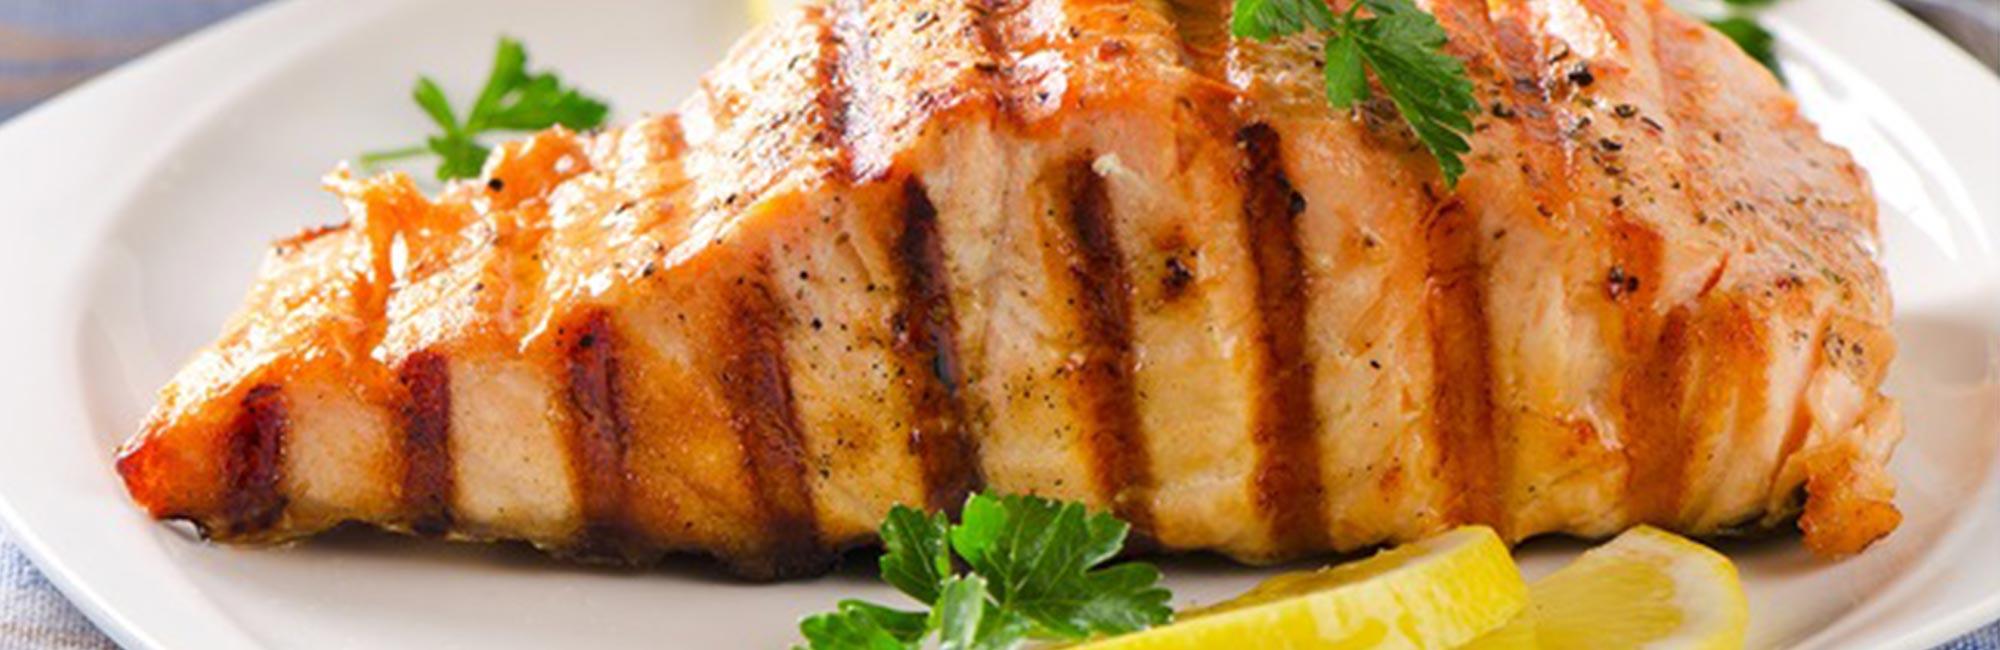 Grilled Salmon Steak with Leeks Recipe